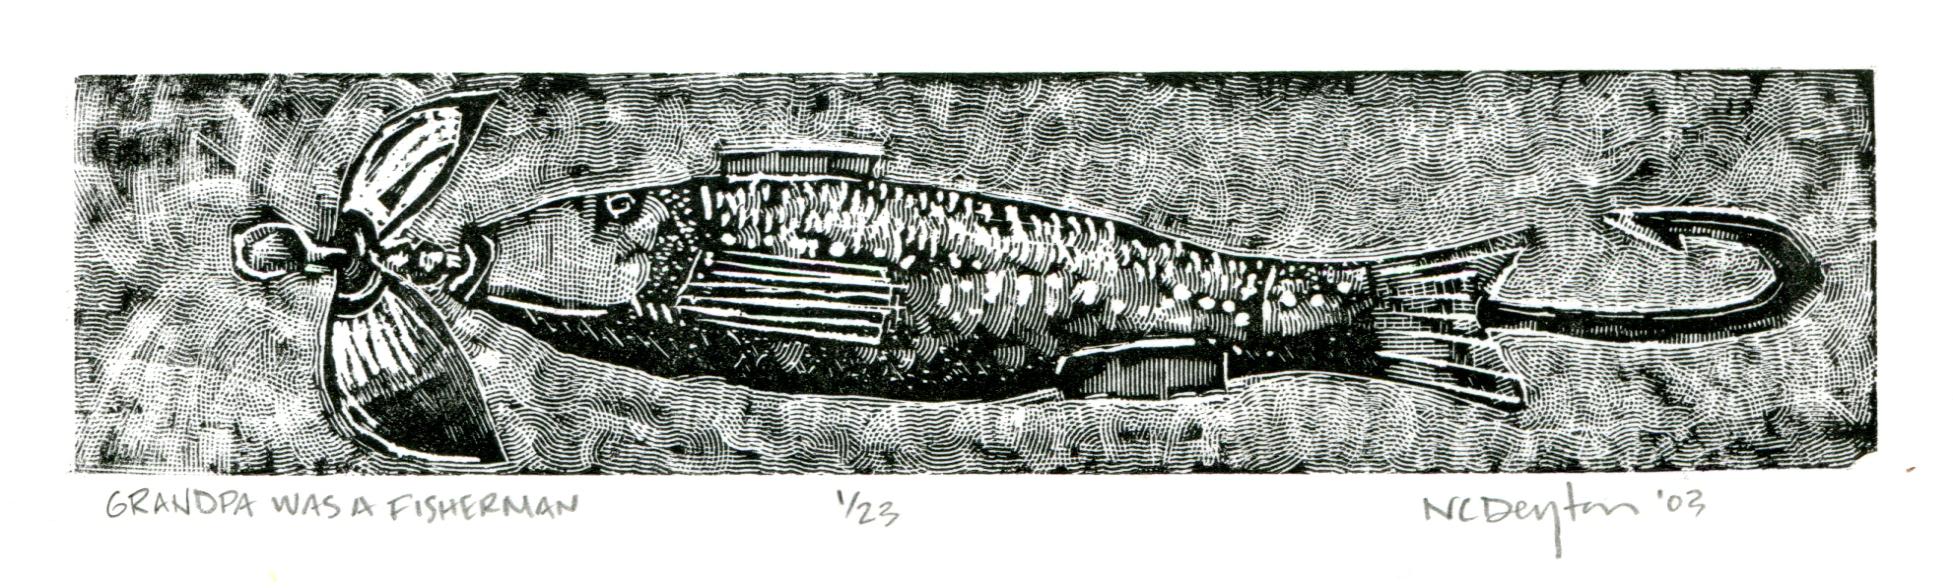 Grandpa was a Fisherman. 2003. Wood engraving. -